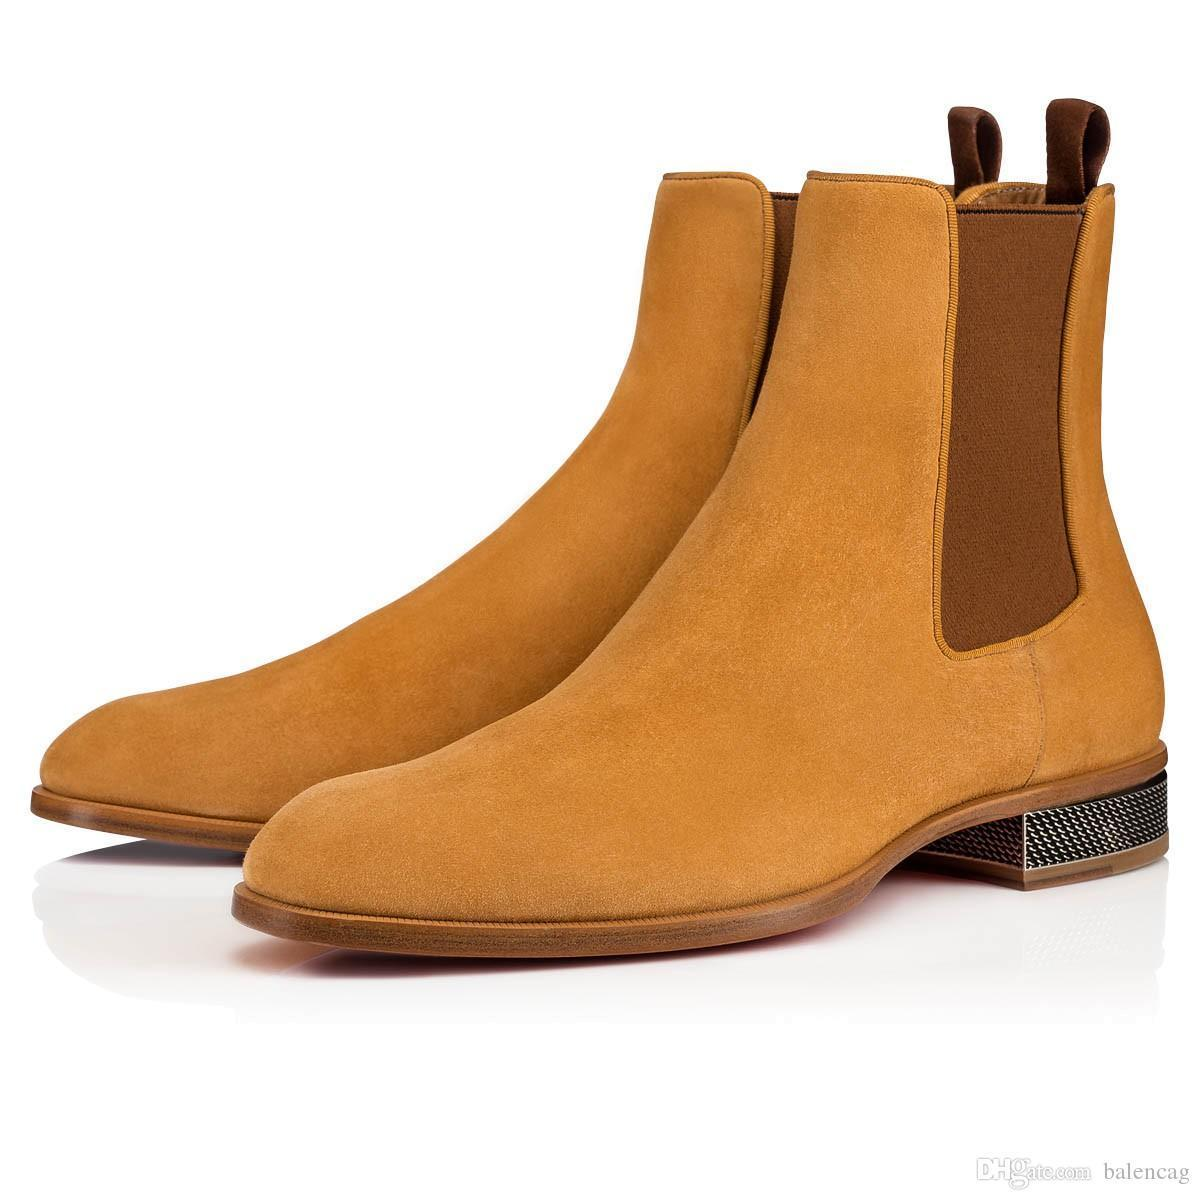 Super qualità 2019 Automne Hiver Bottes Marque Designers Red Bottom hommes Bottines Samson Orlato hommes robe de mariée Flats en cuir Chaussures